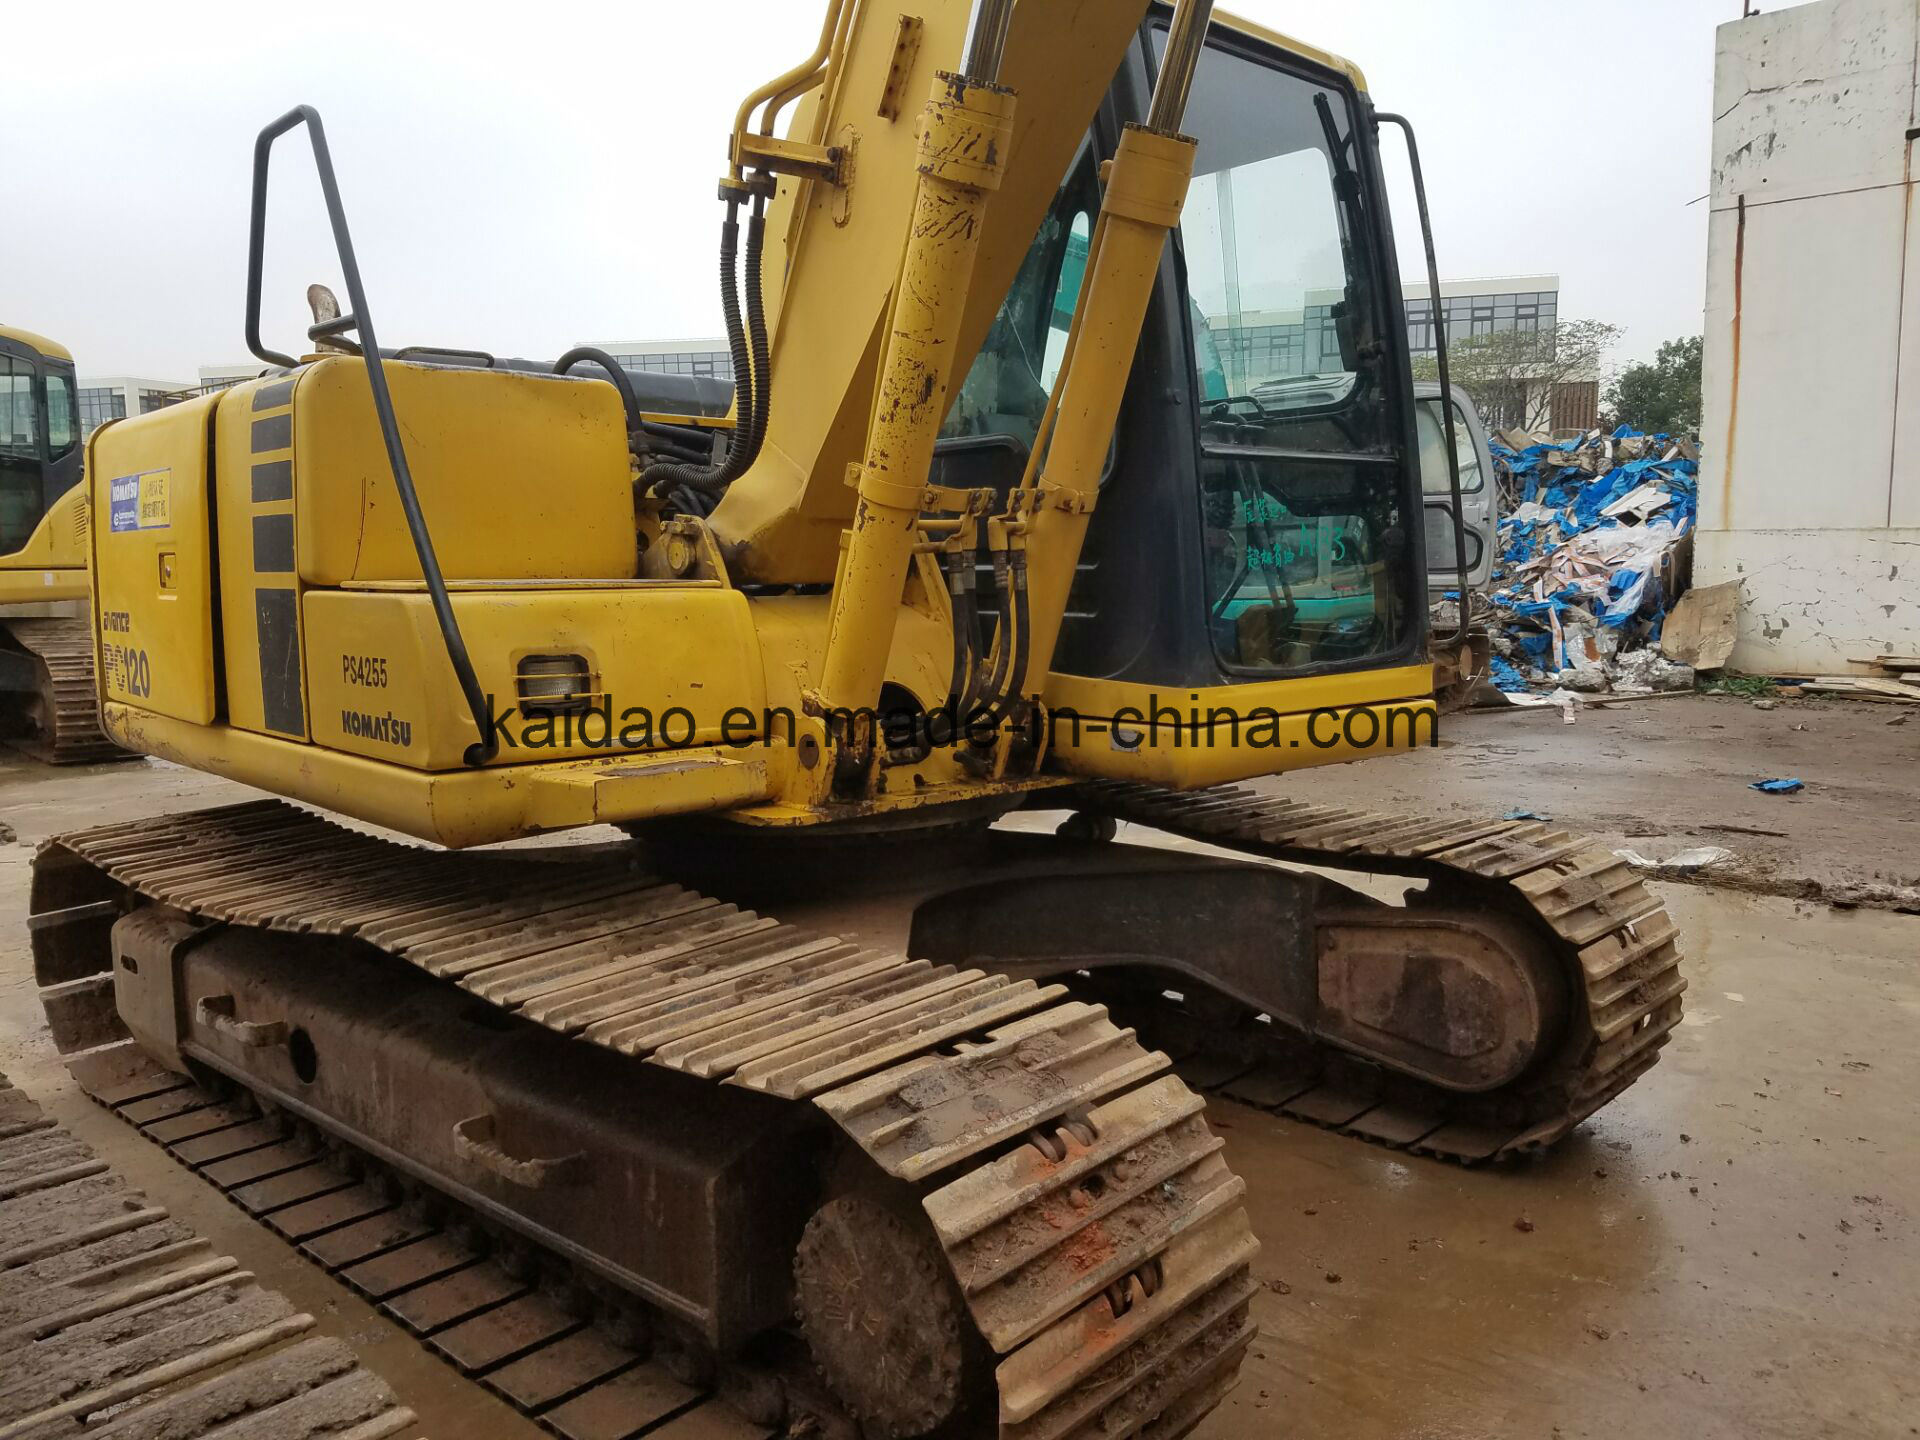 Used Japan Excavator Komatsu PC120 for Sale/Used Komatsu PC120-6 Excavator  Digger